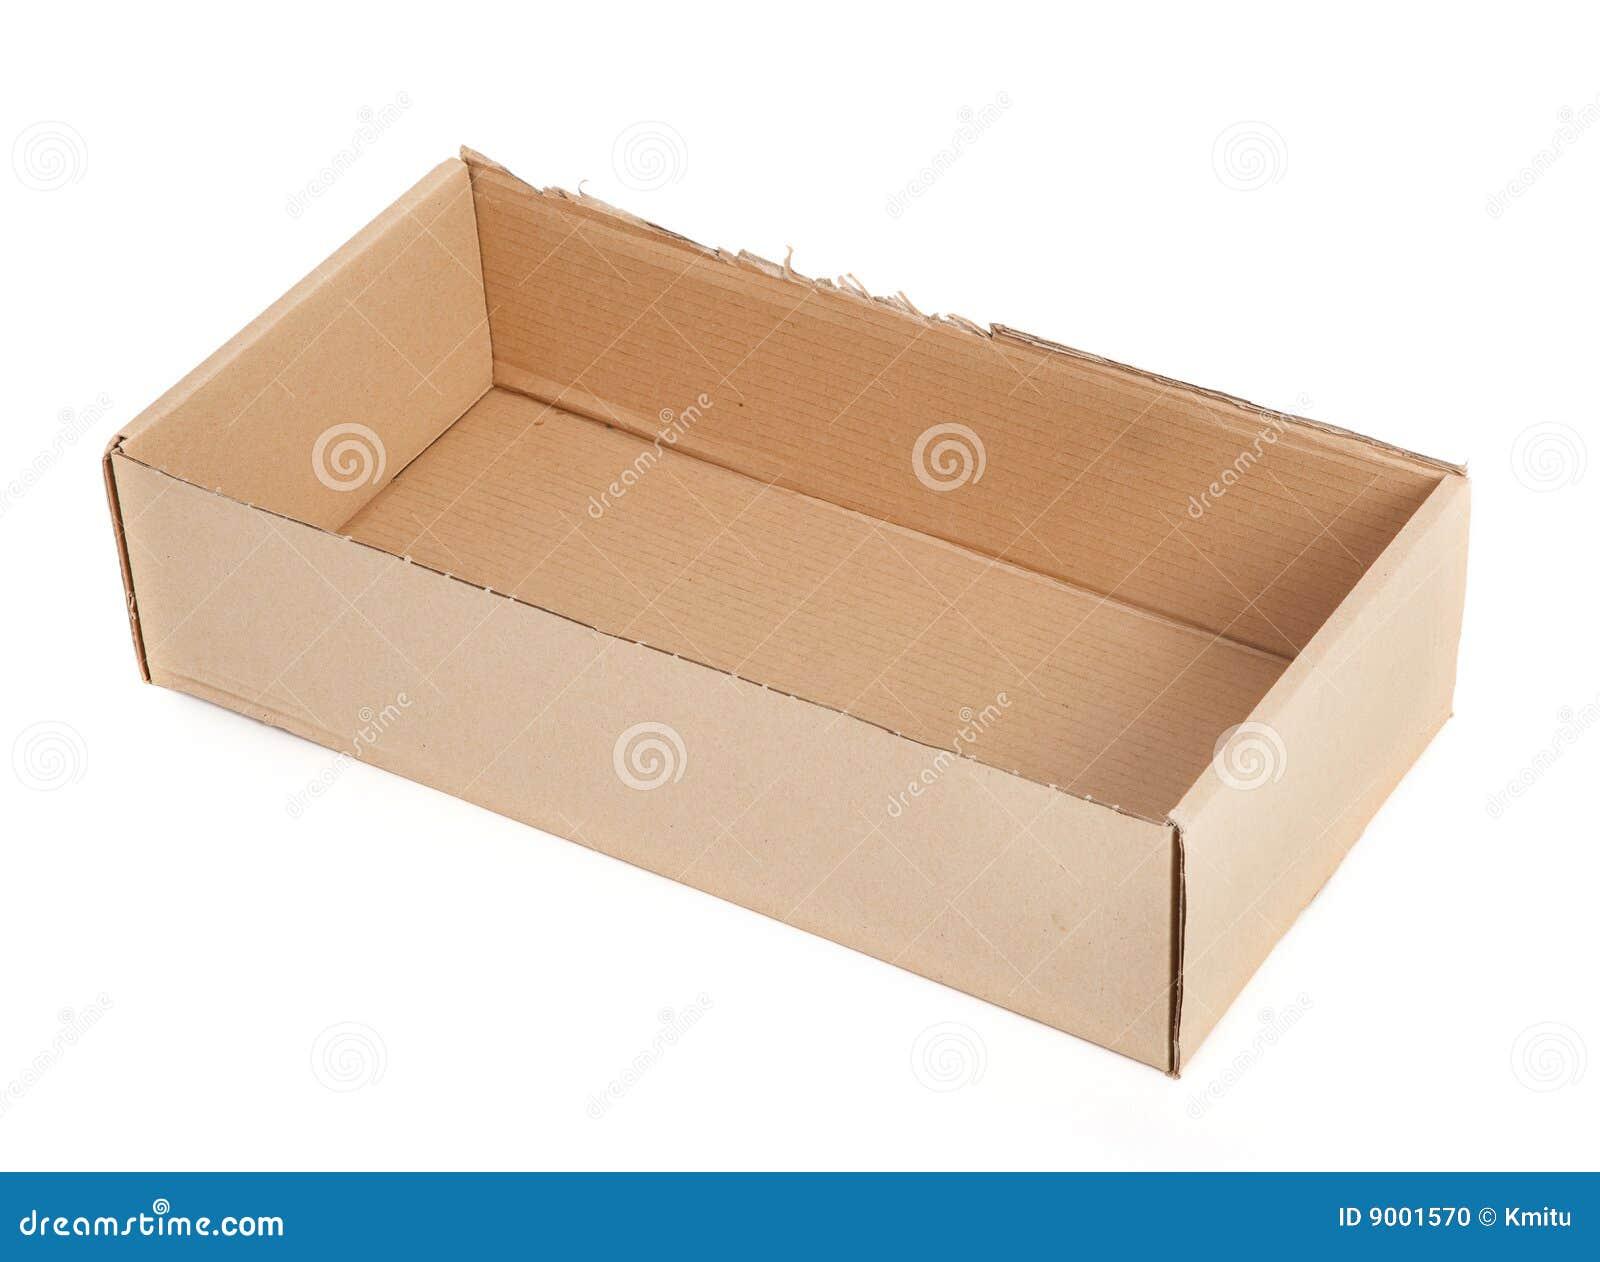 cardboard box without a lid stock photo image of shot parcel 9001570. Black Bedroom Furniture Sets. Home Design Ideas